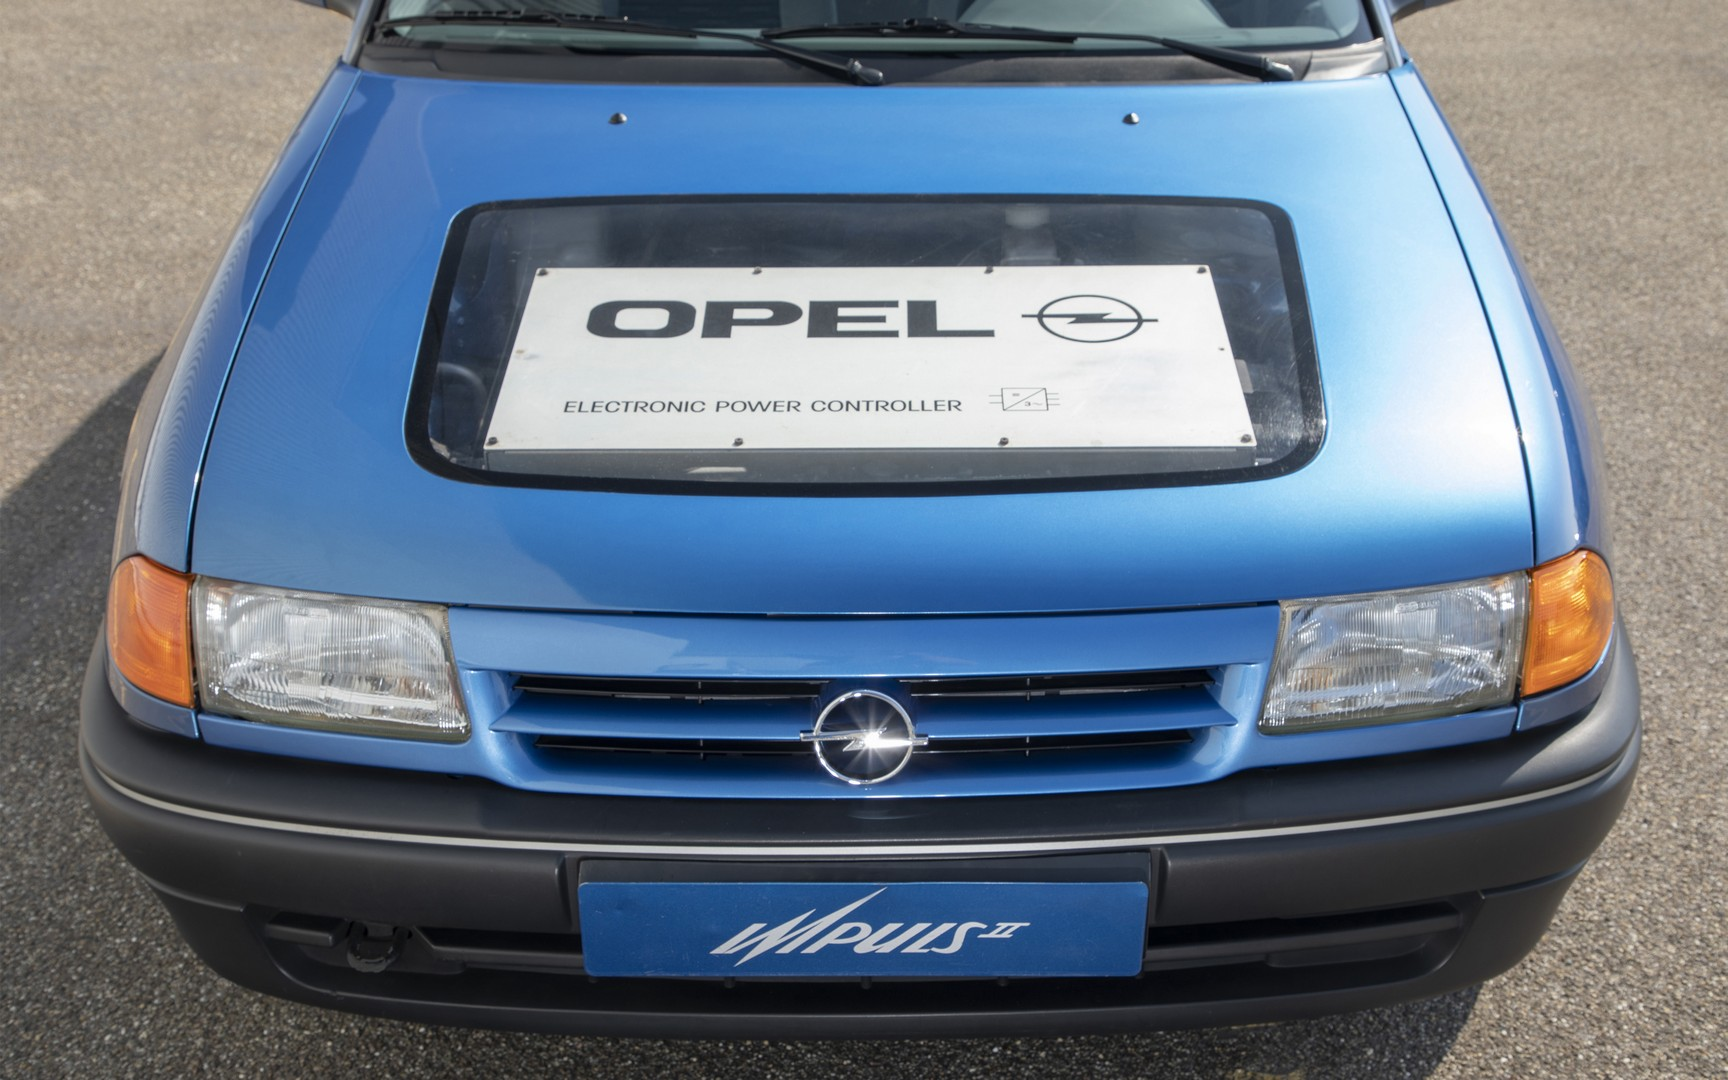 Opel Impuls